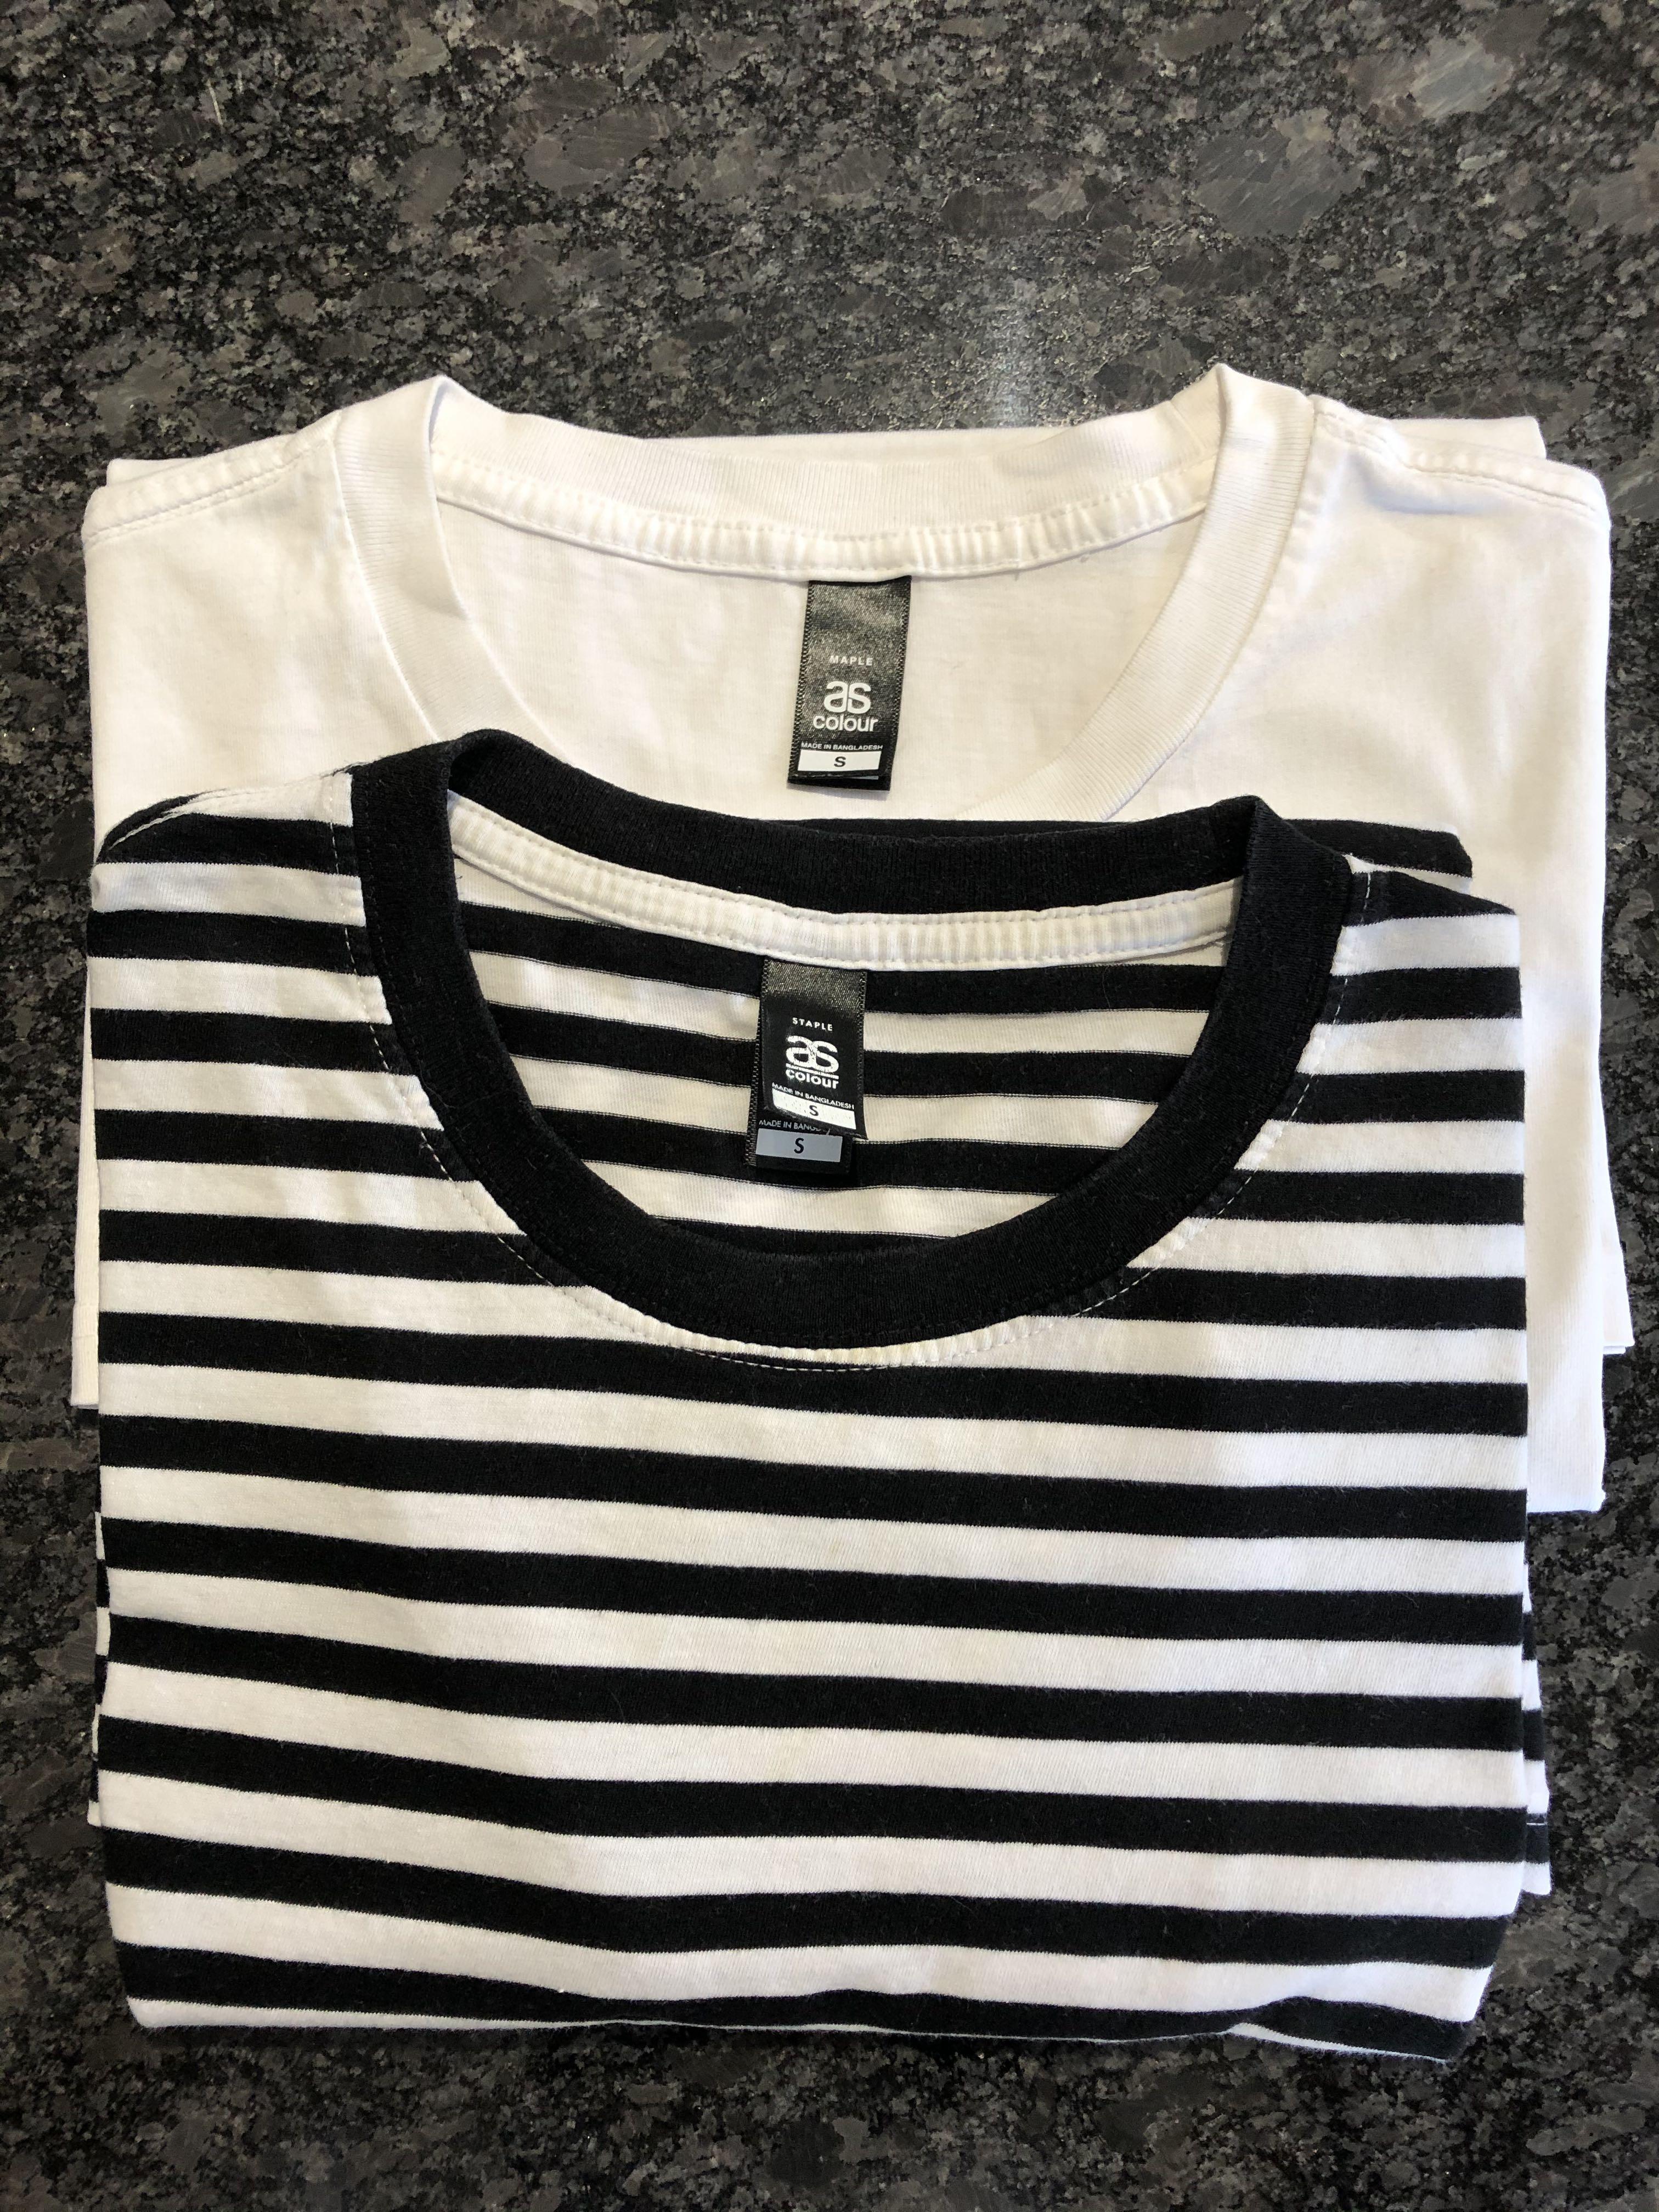 AS Colour Stripe T-shirts